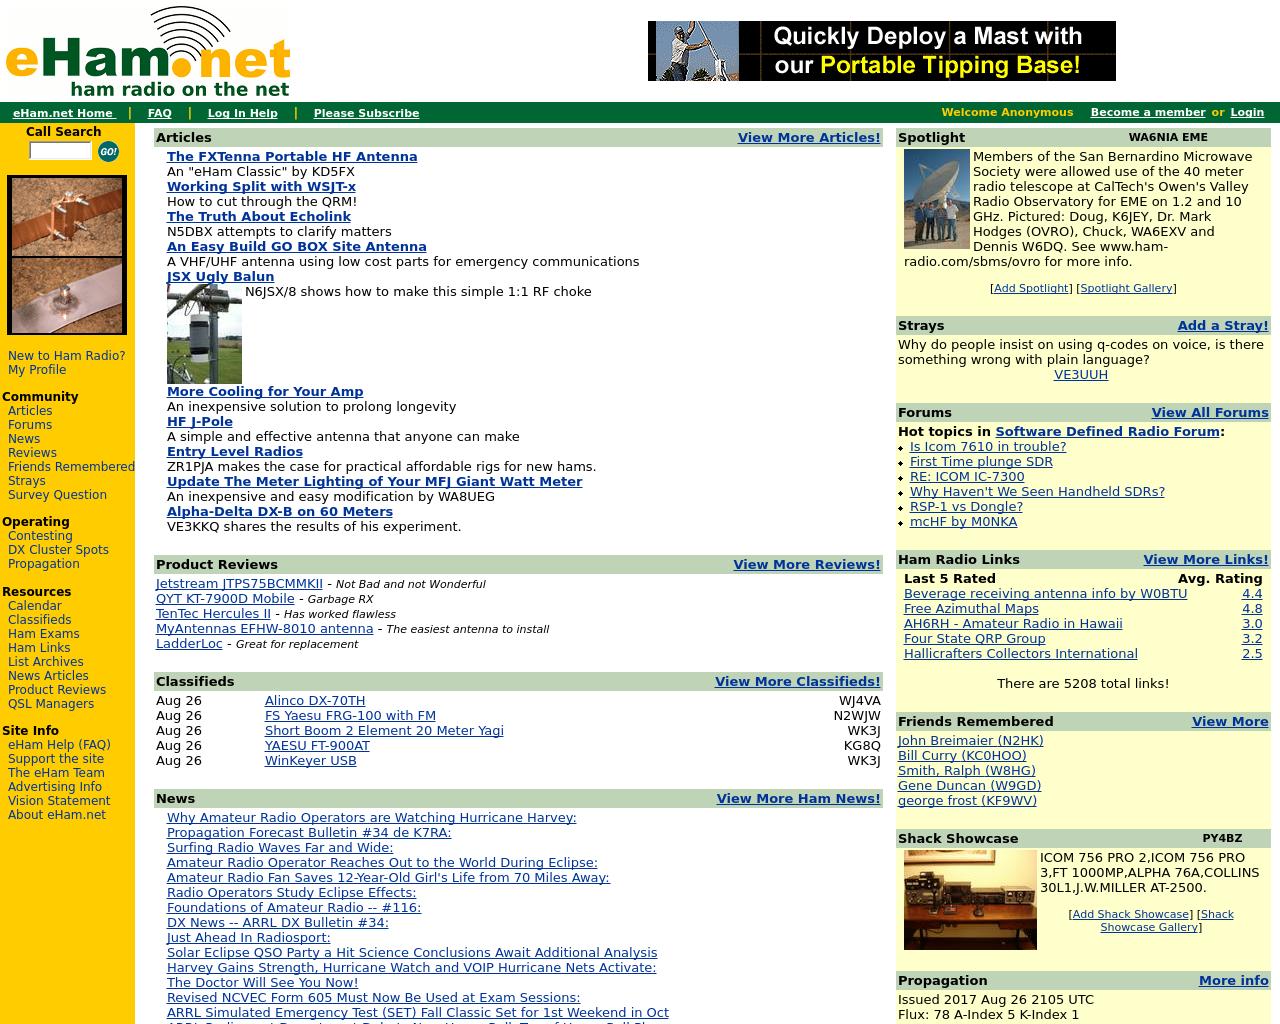 eHAM.net-Advertising-Reviews-Pricing